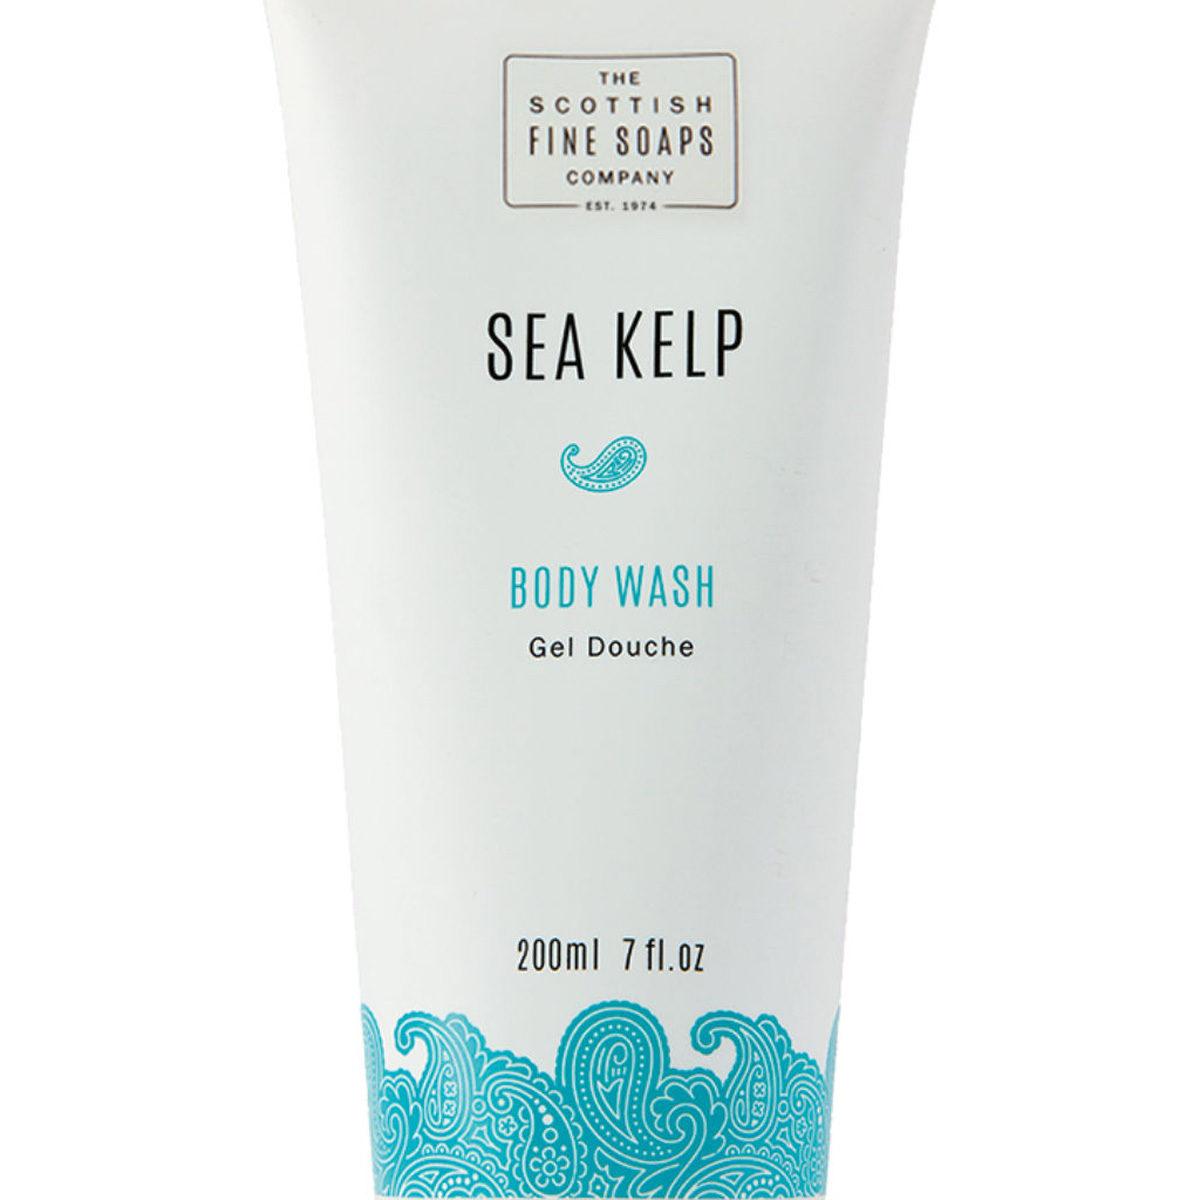 Sea Kelp Body Wash